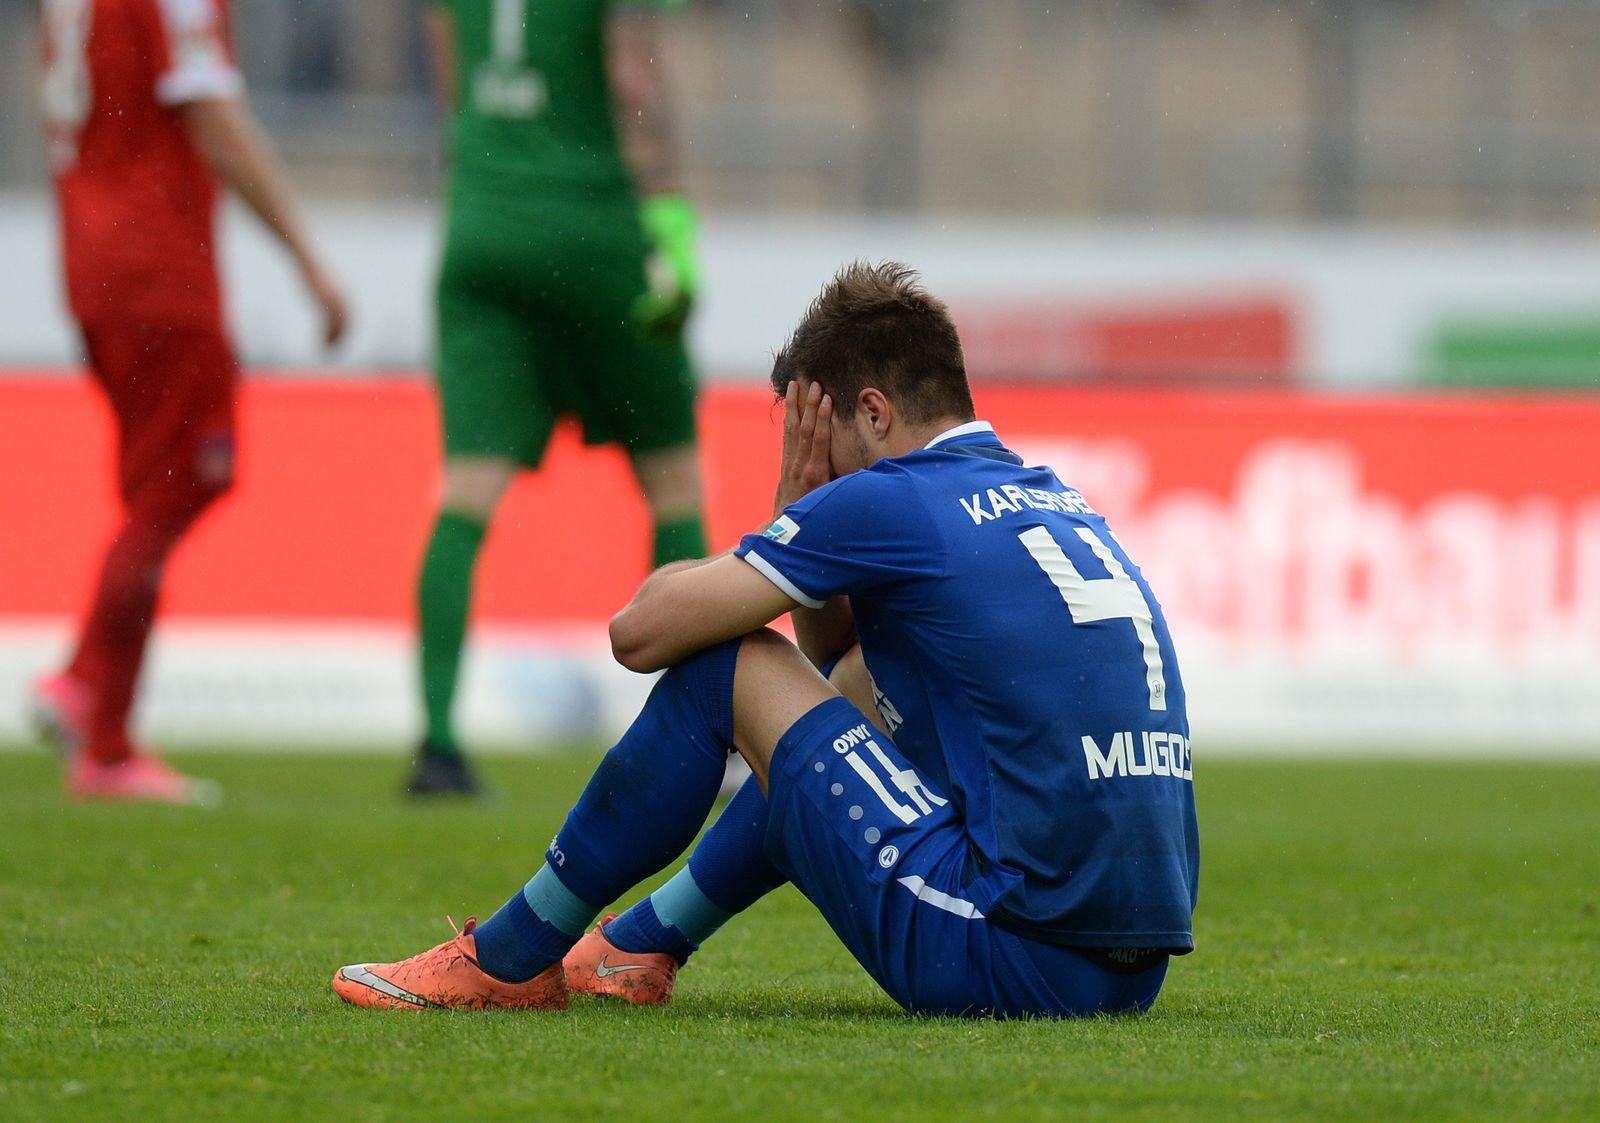 Karlsruher SC - 1. FC Heidenheim